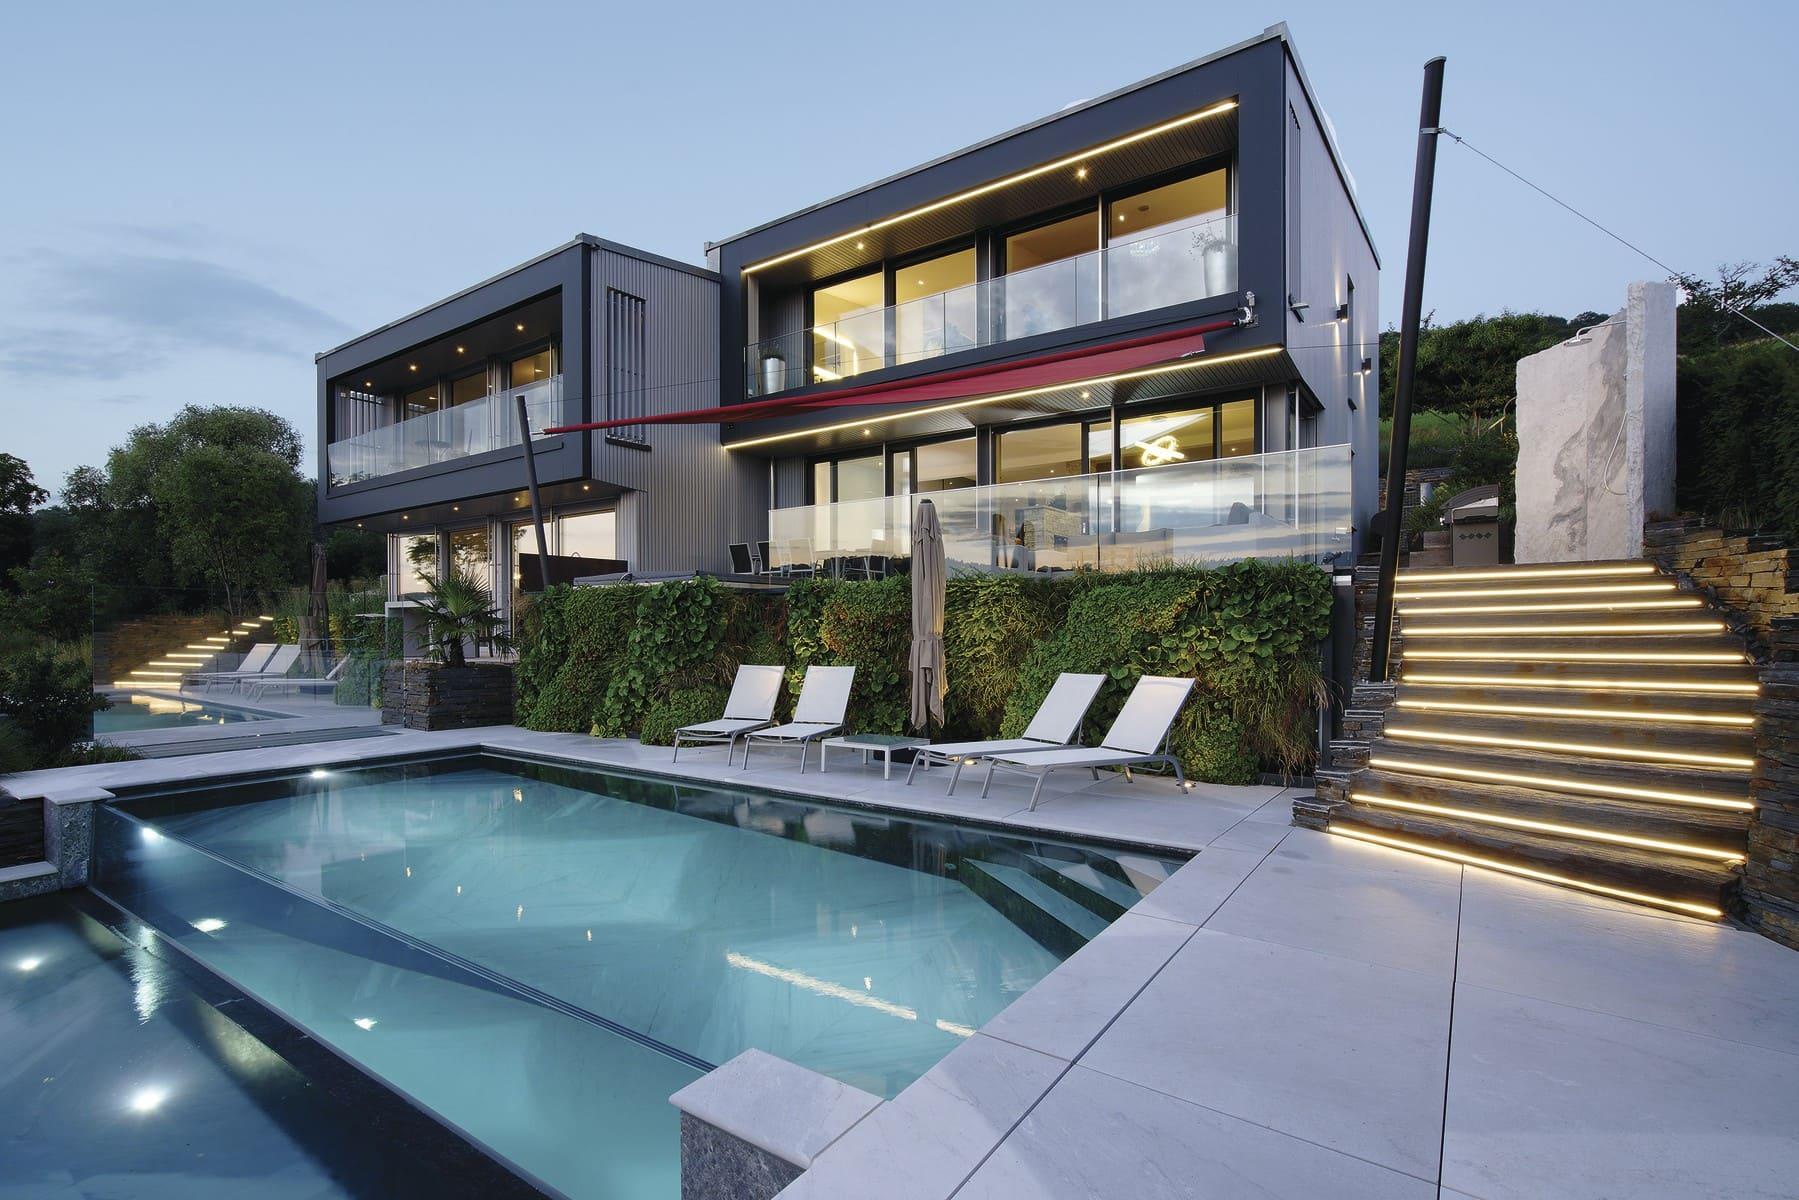 Doppelhaus Villa modern in Hanglage mit Flachdach & Pool Terrasse - WeberHaus Fertighaus - HausbauDirekt.de